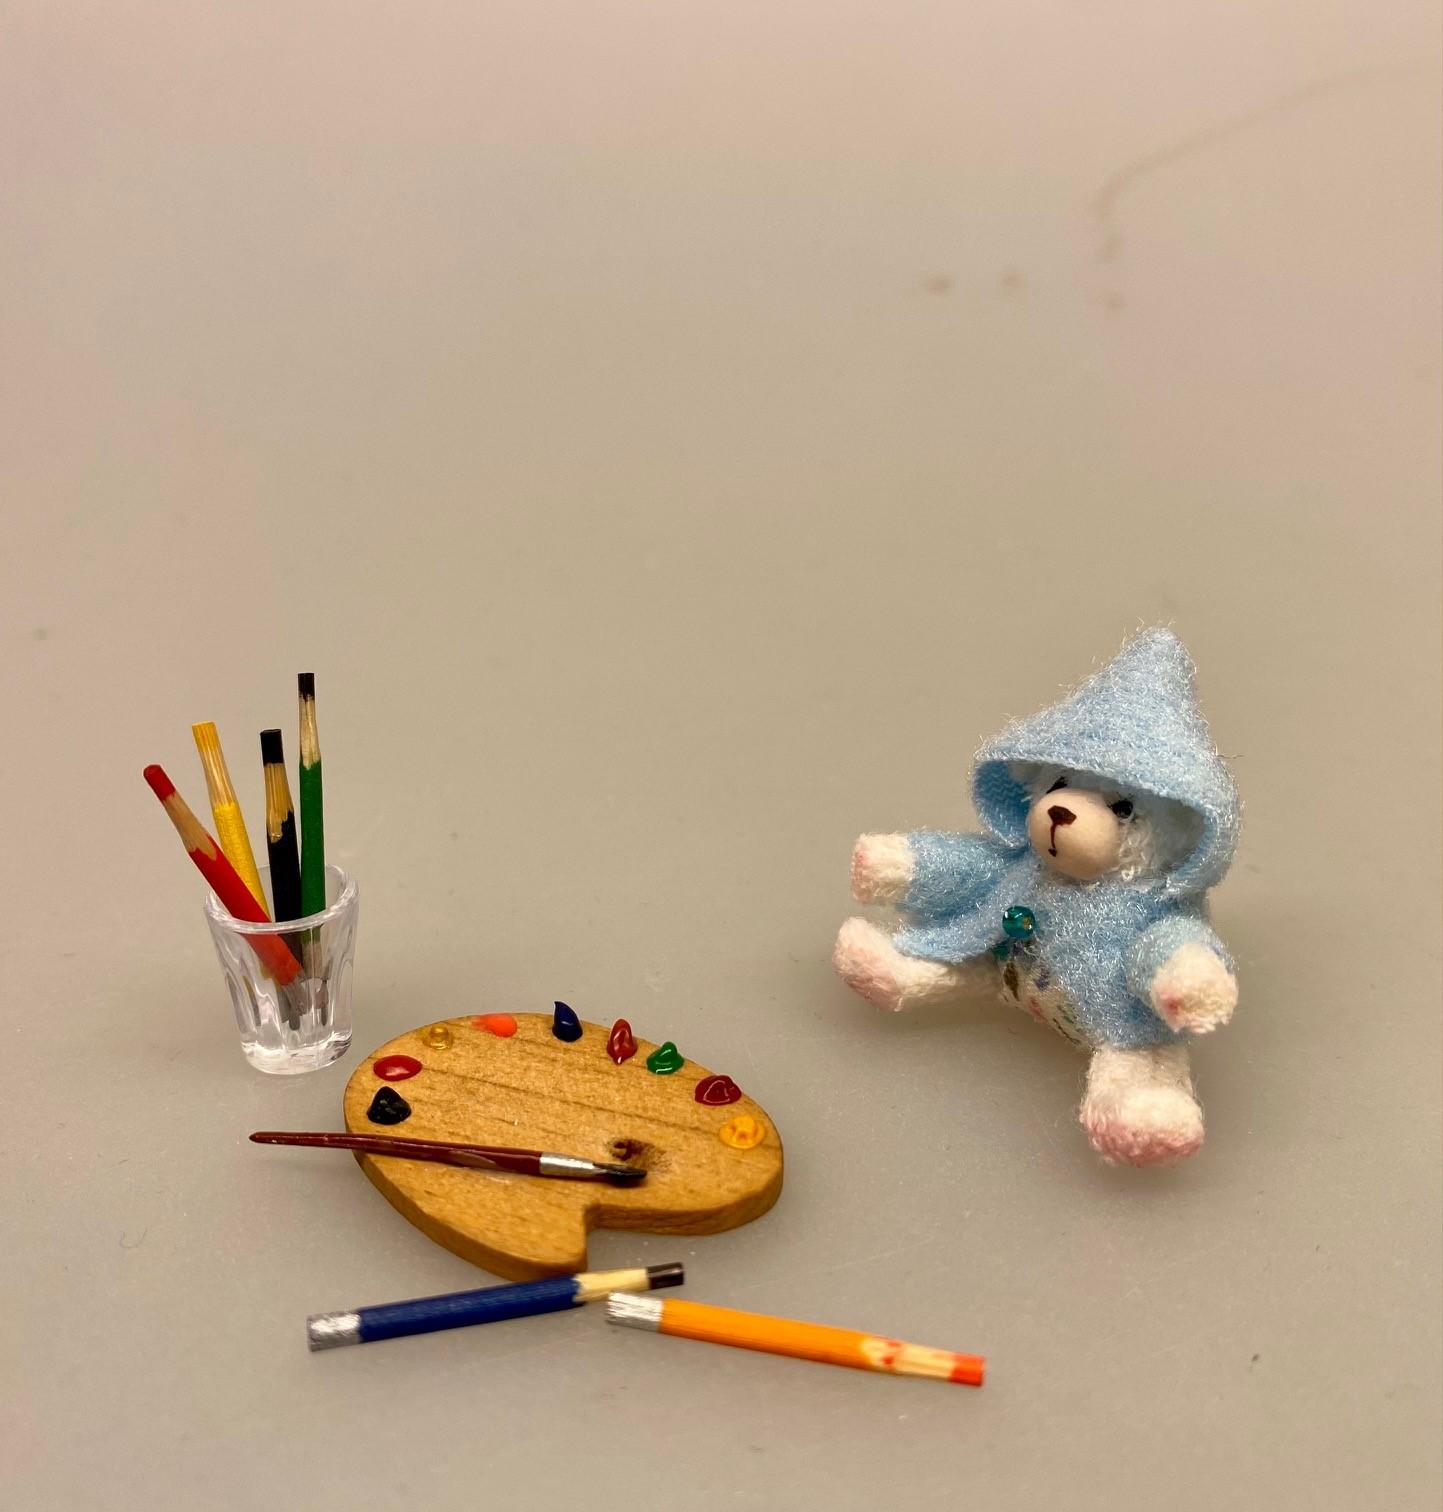 Miniature Plys Bamse med lyseblå trøje, bamse, mikro, miniature, bjørn, teddy, plysbjørn, paddington, peter plys, bamsebjørn, legetøj, krammebamse, sætterkasse, sættekasse, ting til, dukkehuset, børneværelset, dukkehus, dukkestue, nisser, nissebo, nissedør, sangskjuler, barnedåb, symbolsk, gaveide, gavekort, sjov, kigkasse, biti, ribe, Miniature Malertuber, kunstmaler, maling, oliemaleri, oliefarver, miniature, mini, maleri, maler, sangskjuler, kunst, gavekort, symbolsk, sætterkasse, sættekasse, dukkehus, dukkestue, ting, til, tilbehør, nisser, nisse, 1:12, farver, kreativ,